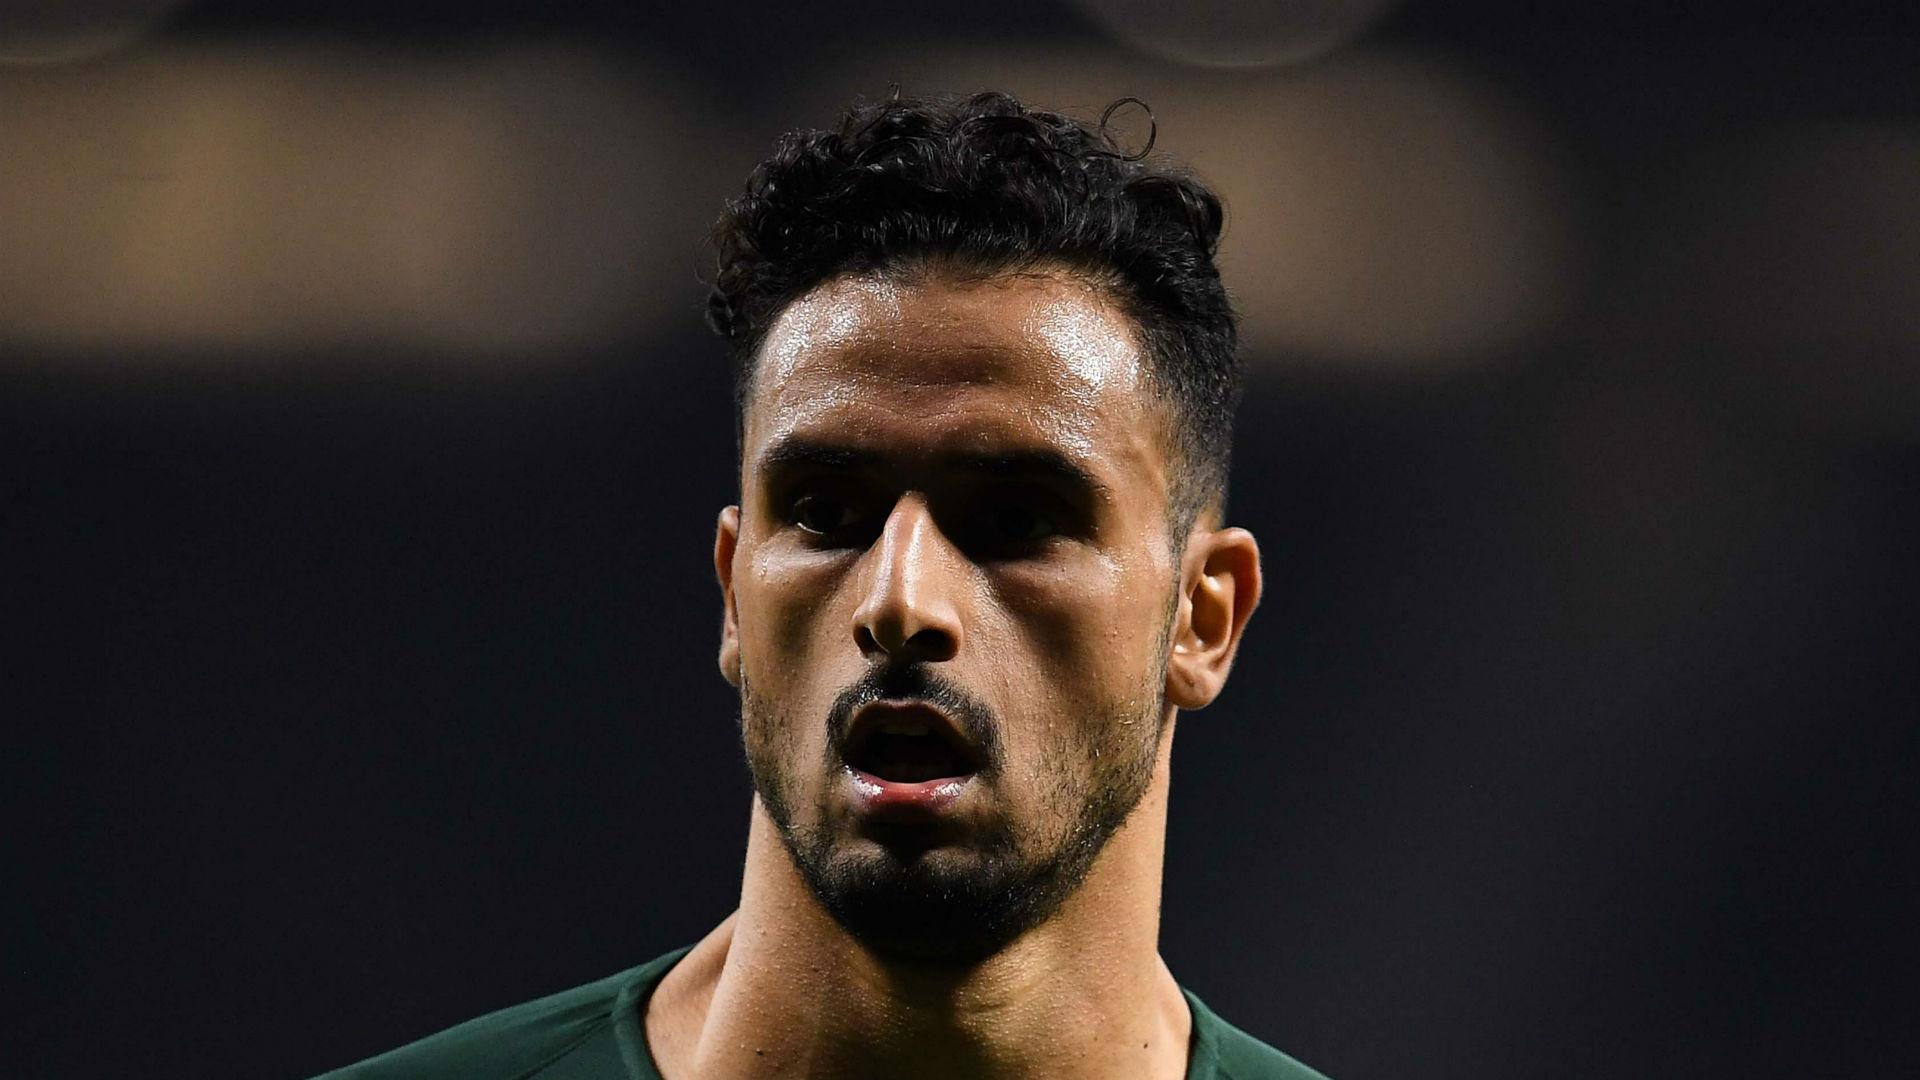 Chadli joins Anderlecht on loan from Monaco